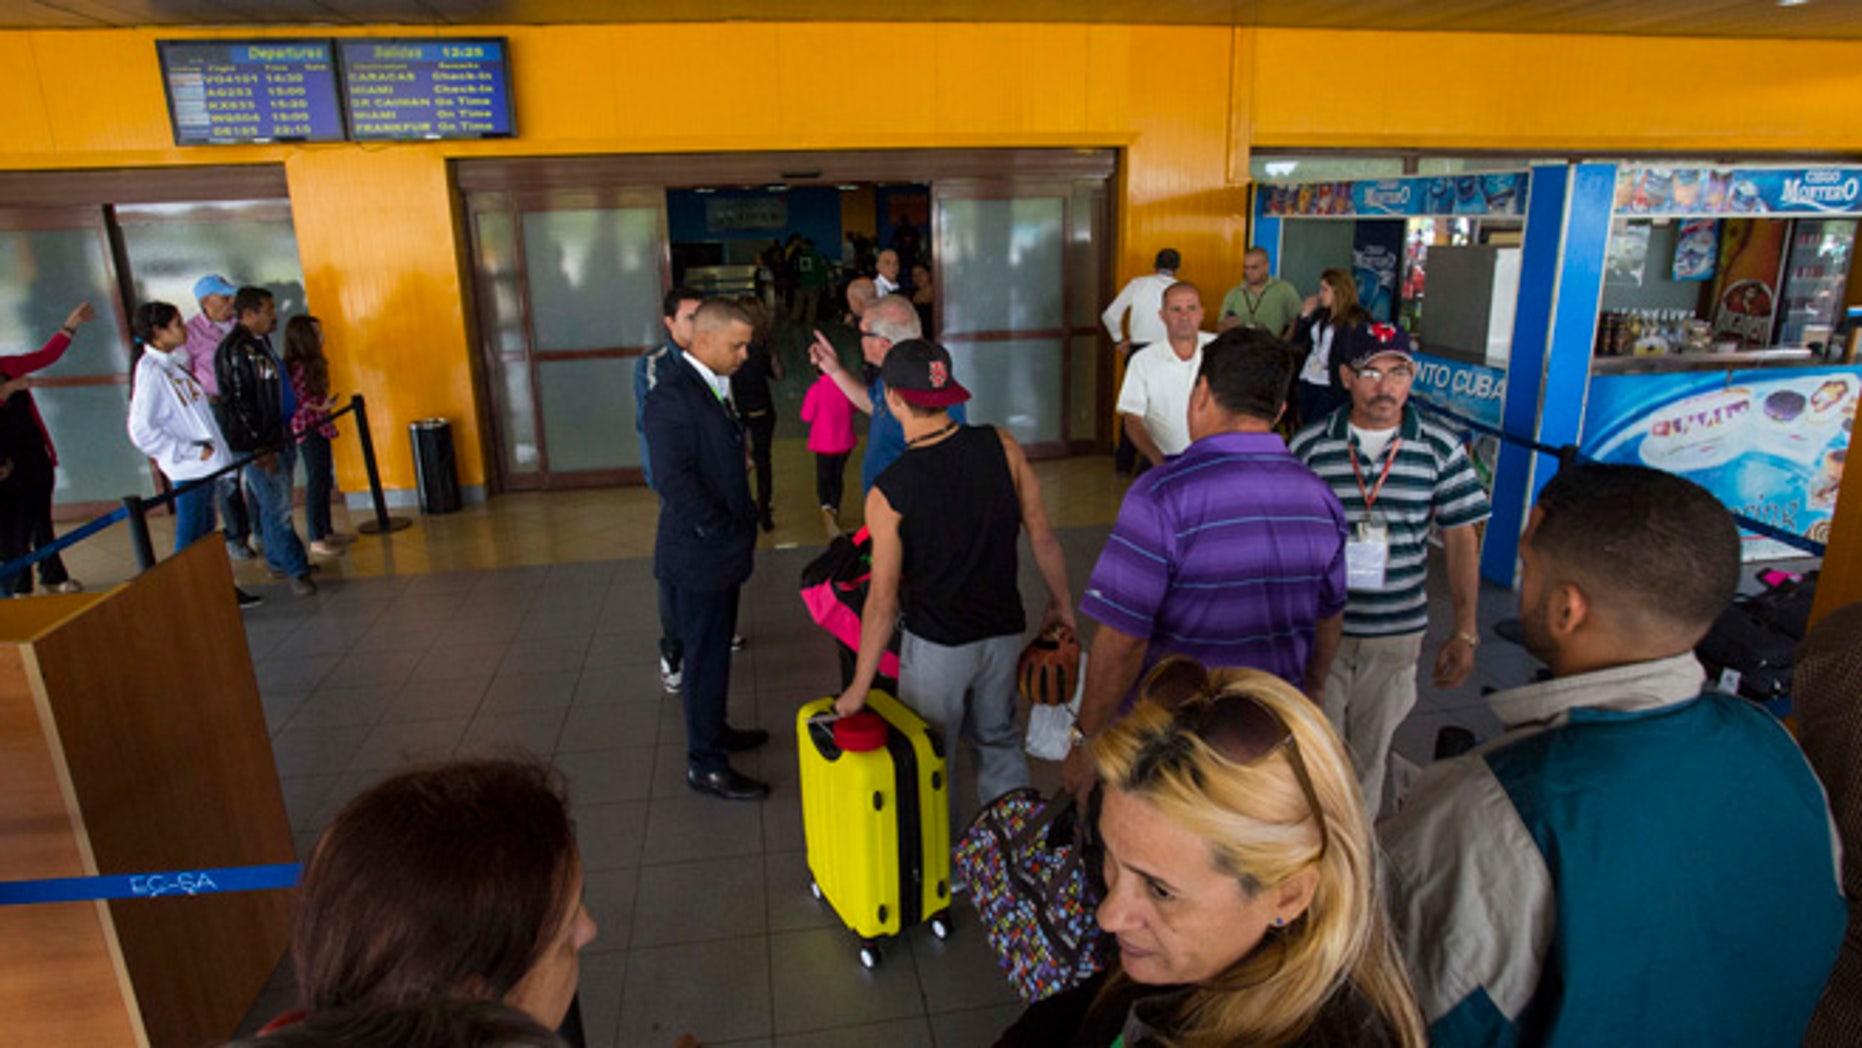 Passengers enter the charter departures at Jose Marti International Airport in Havana, Cuba.